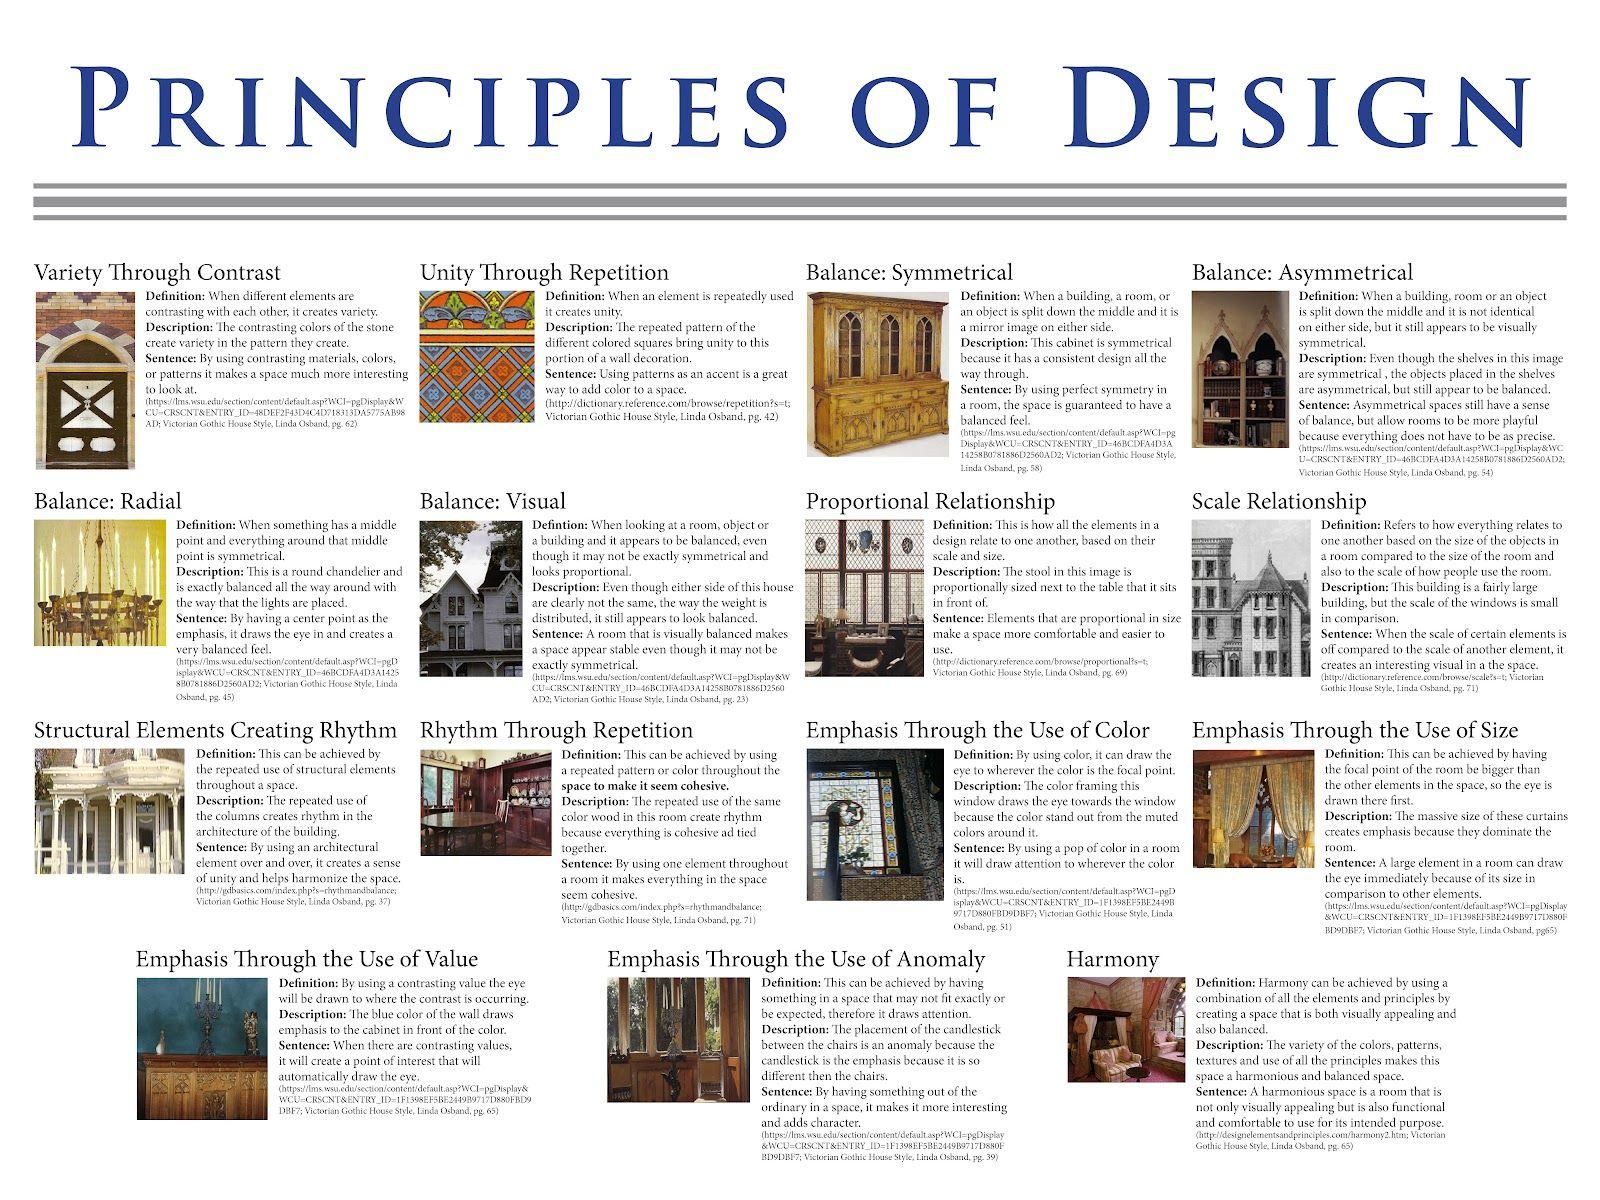 Art Principles Of Design Bing Images Principals Of Design Principles Of Design Design Theory